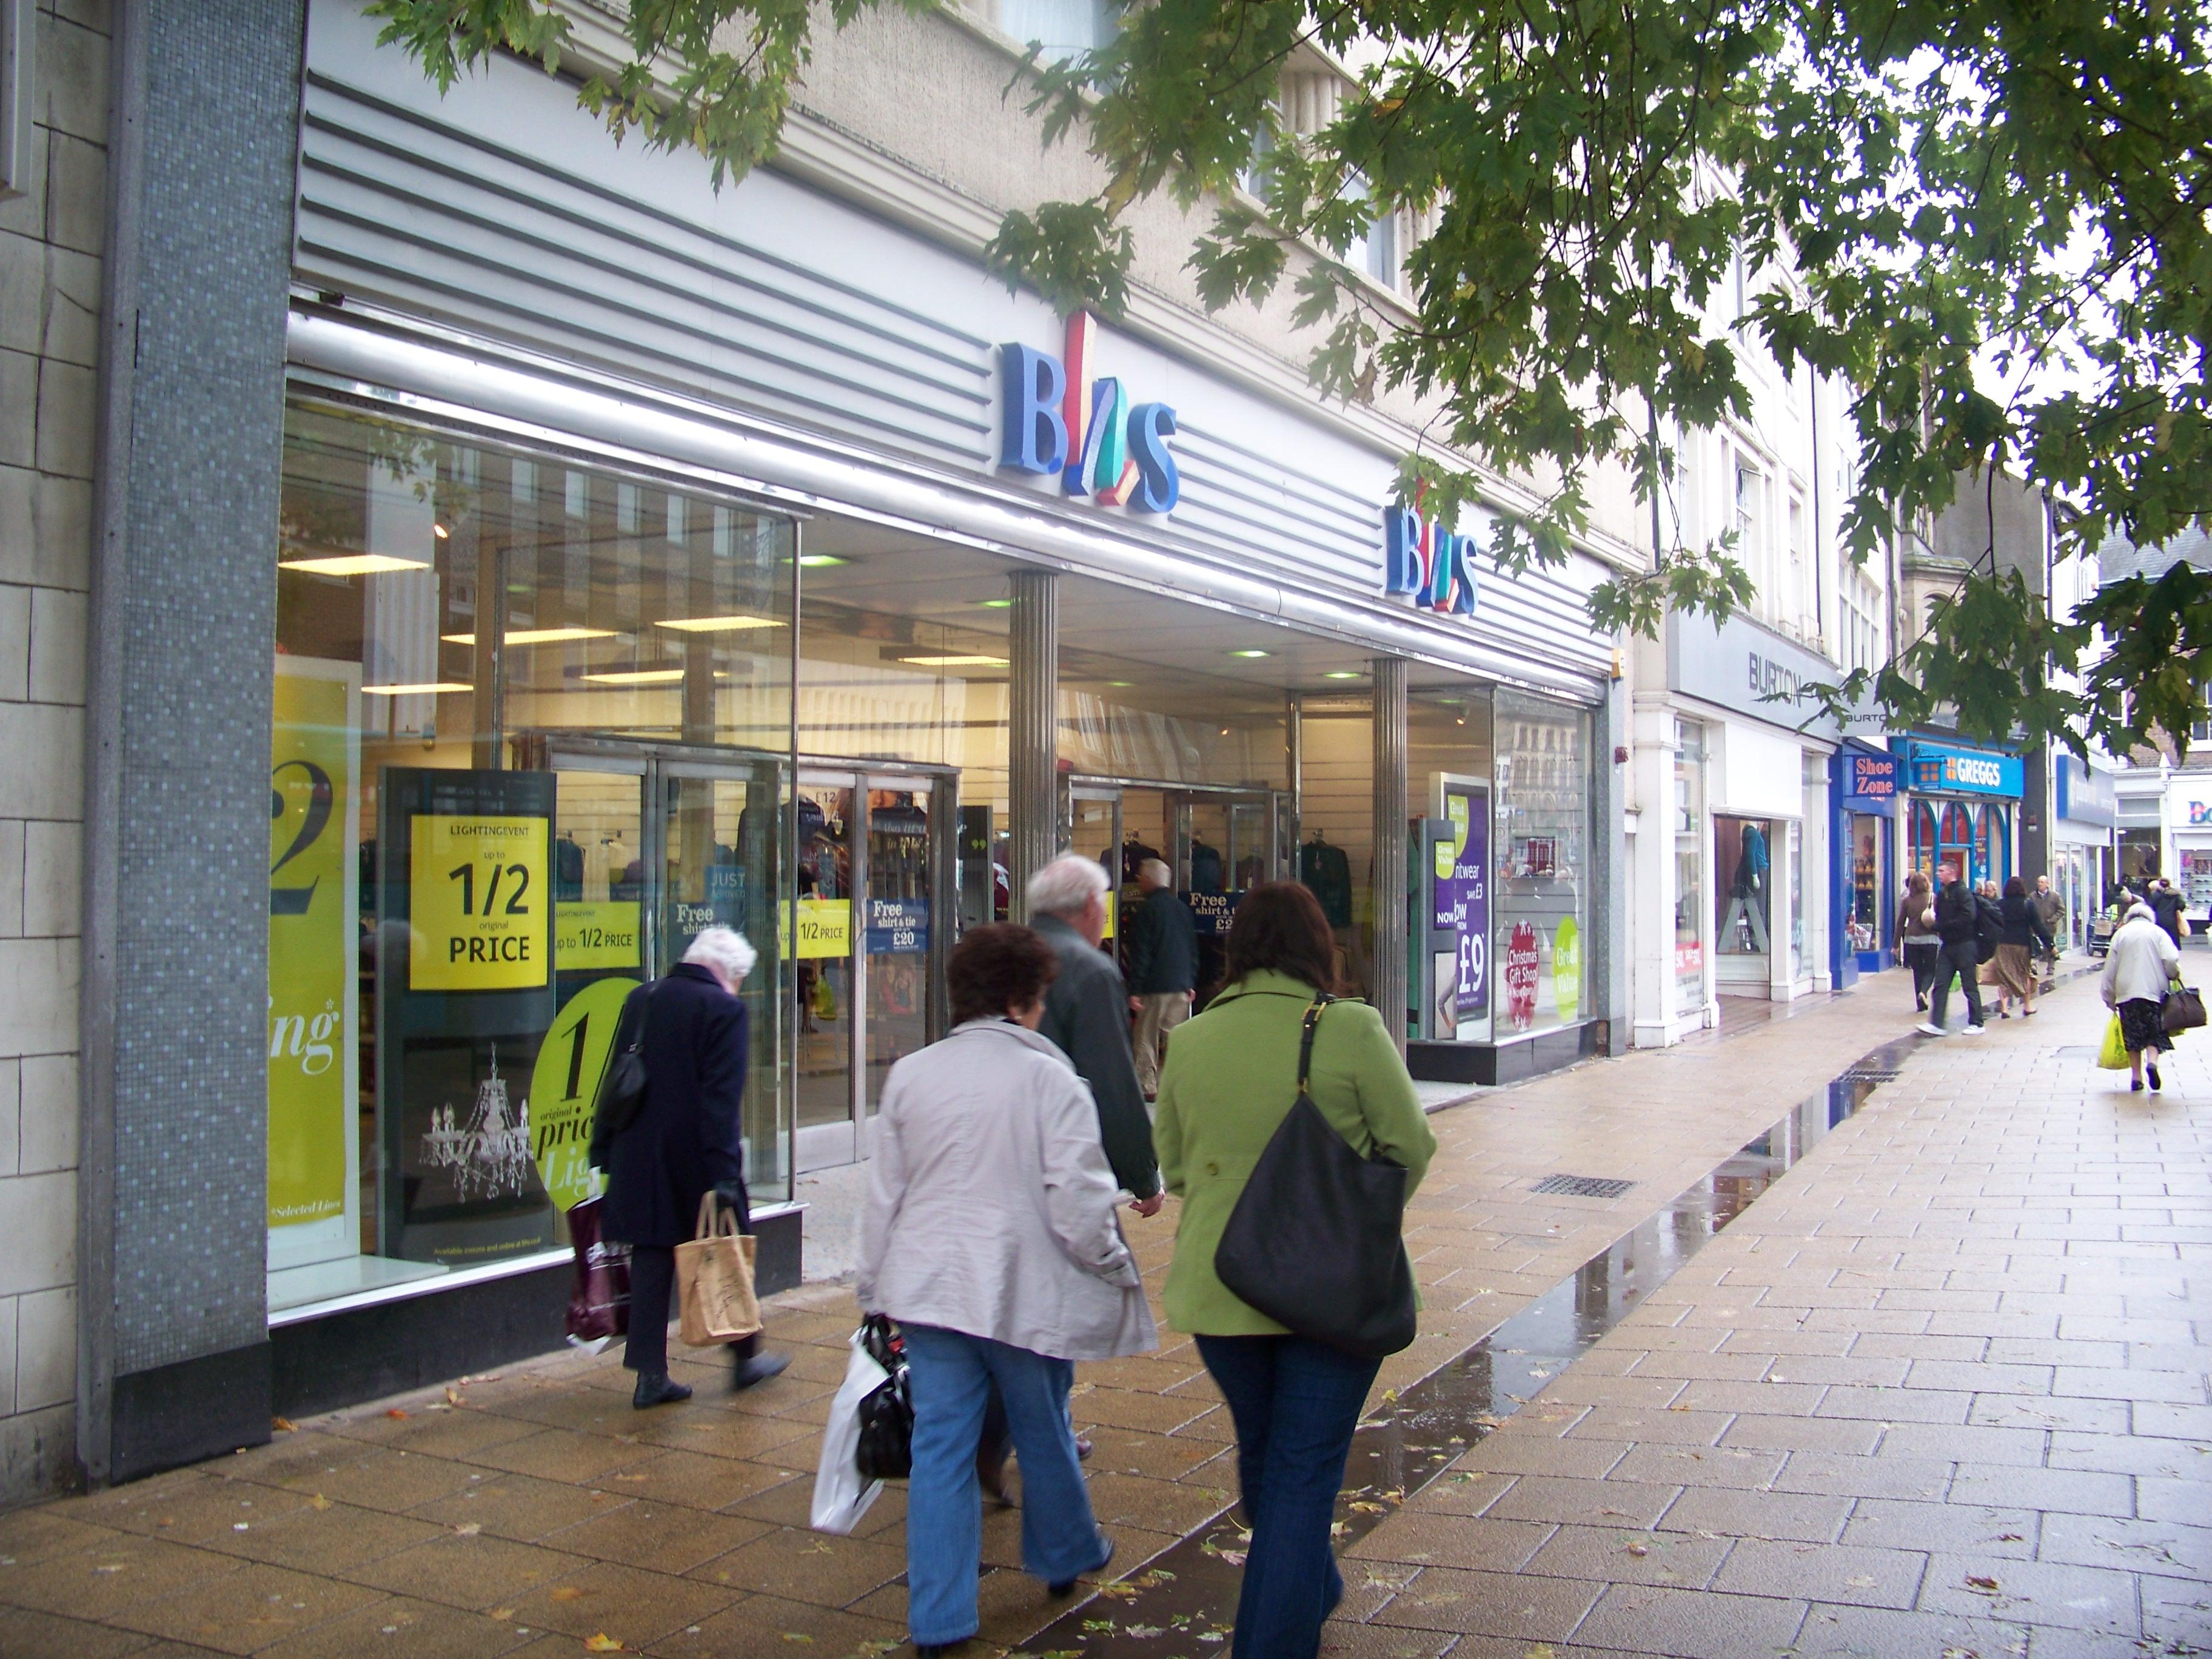 Fashions Shops In Bridgend